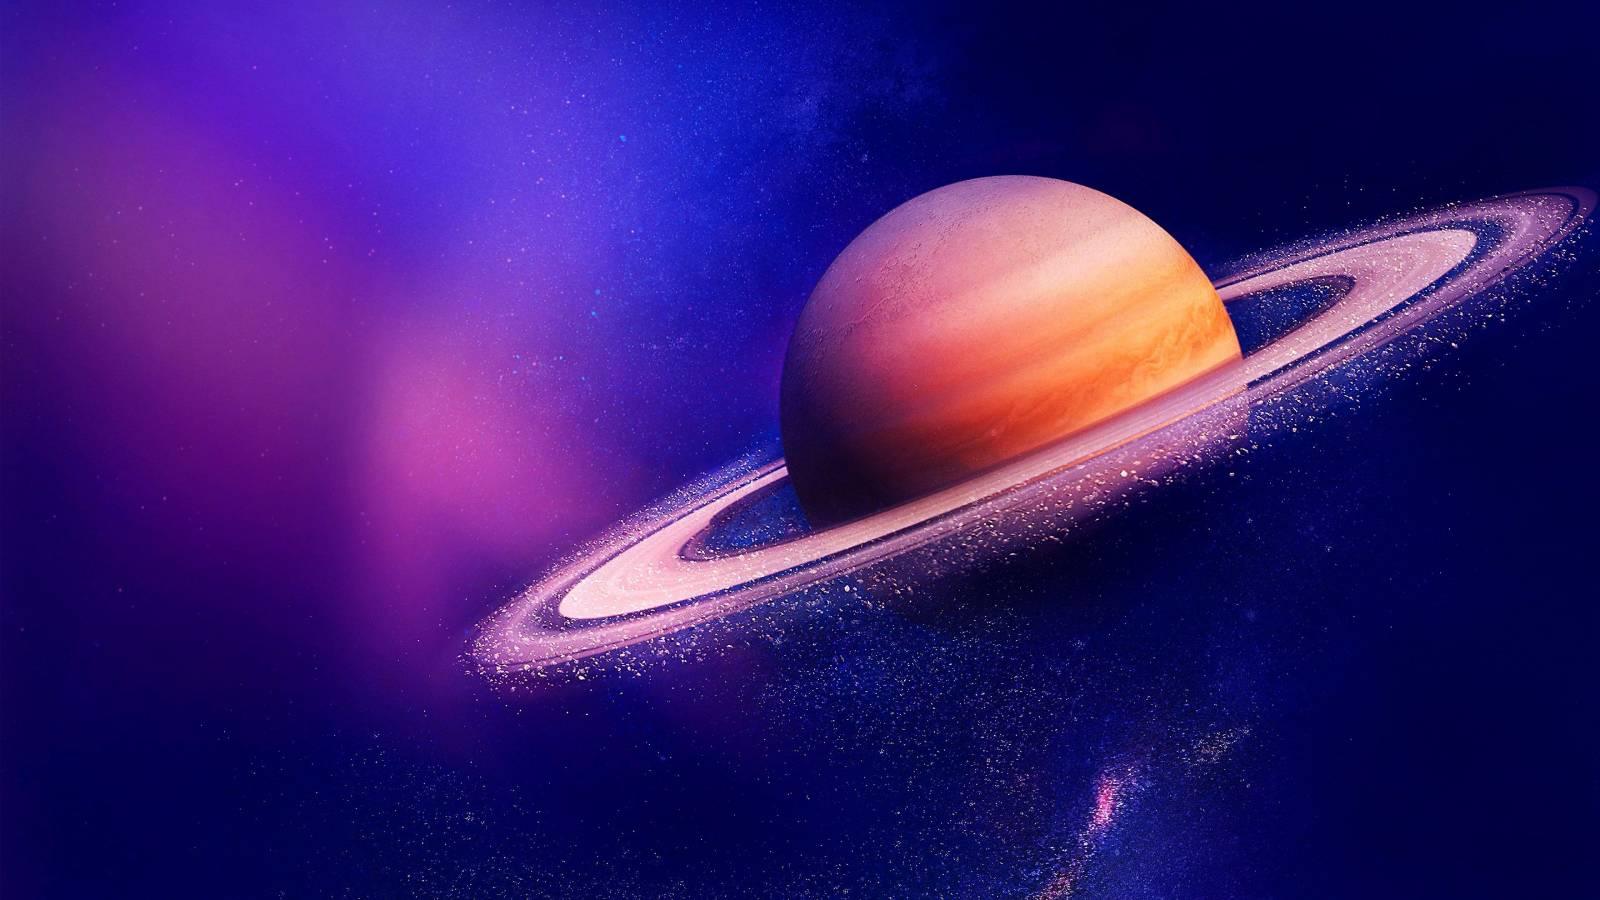 Planeta Saturn submarin